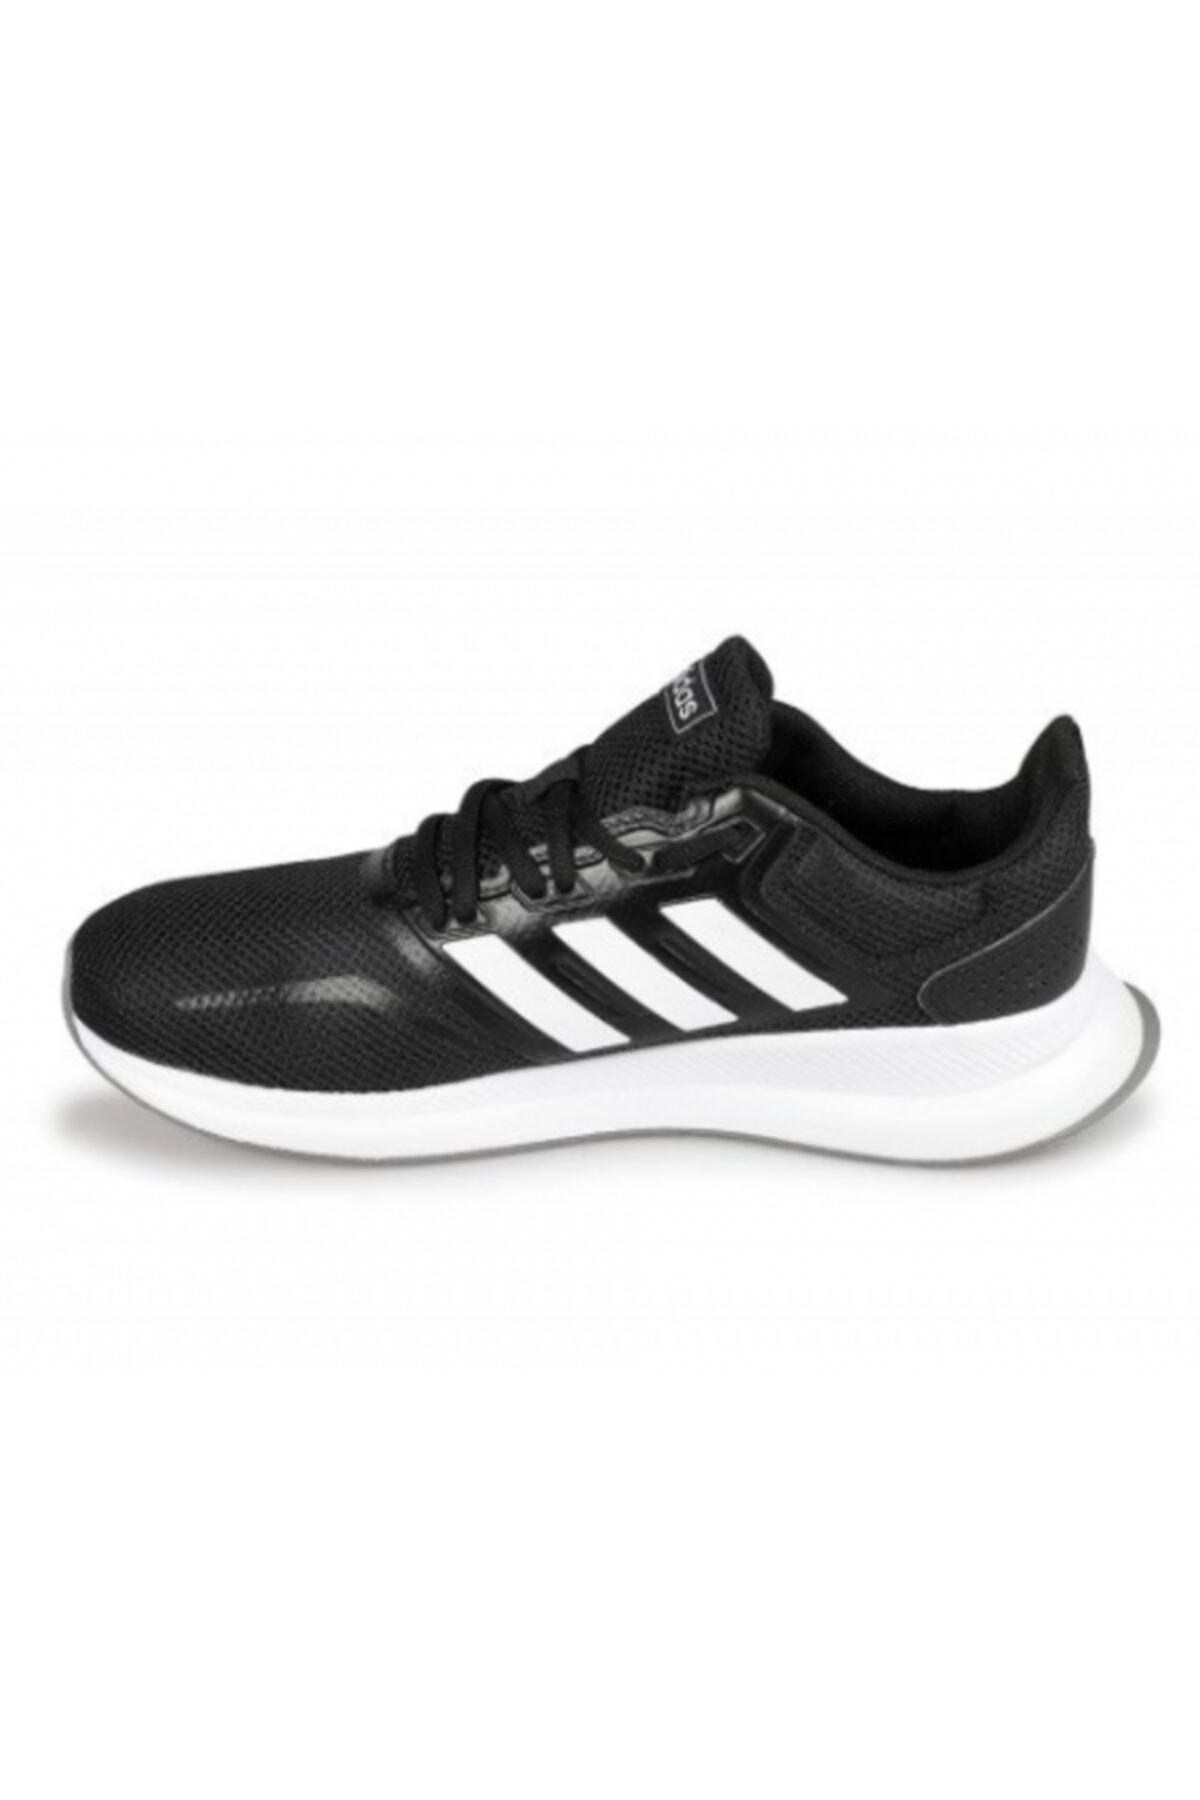 adidas Runfalcon Kadın Siyah Koşu Ayakkabıs F36218 2